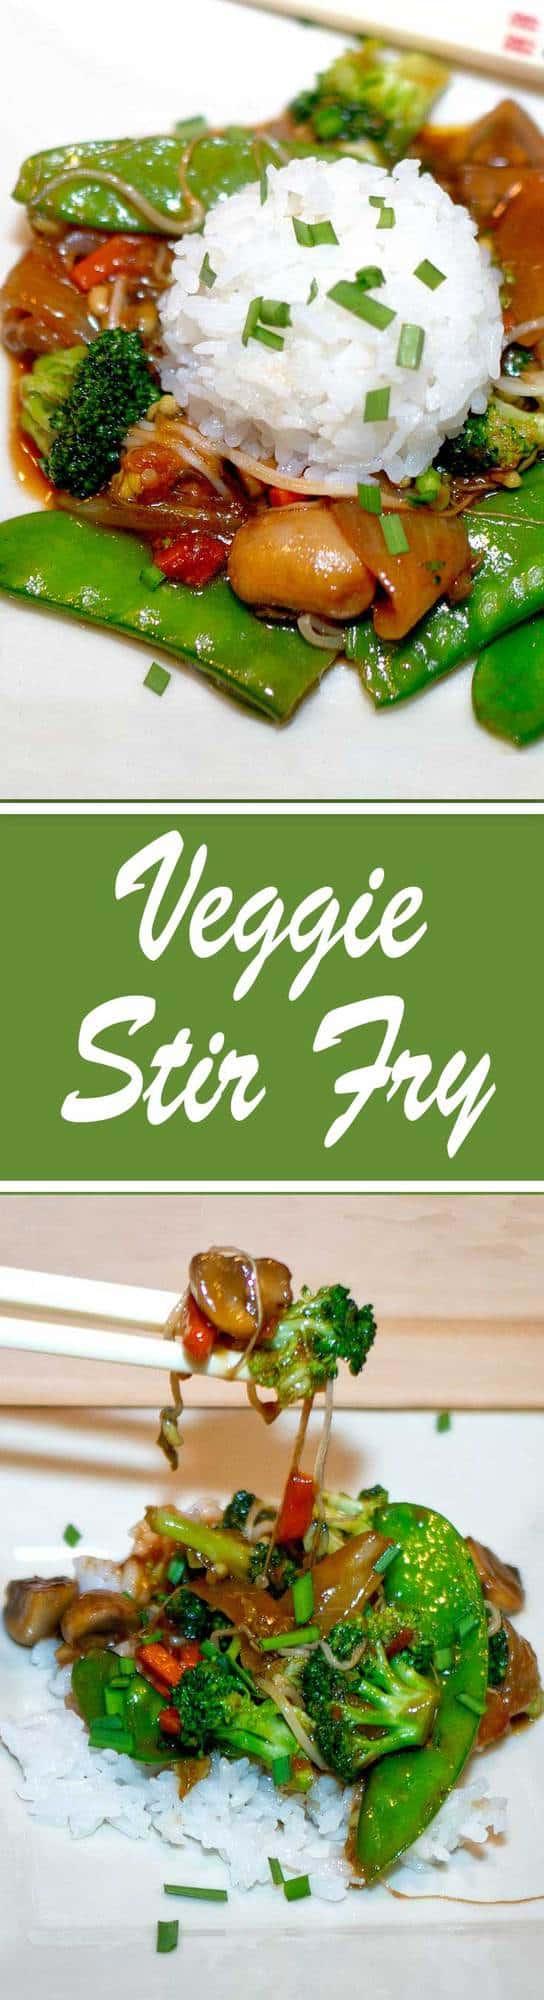 LP_Veggie_Stir_Fry